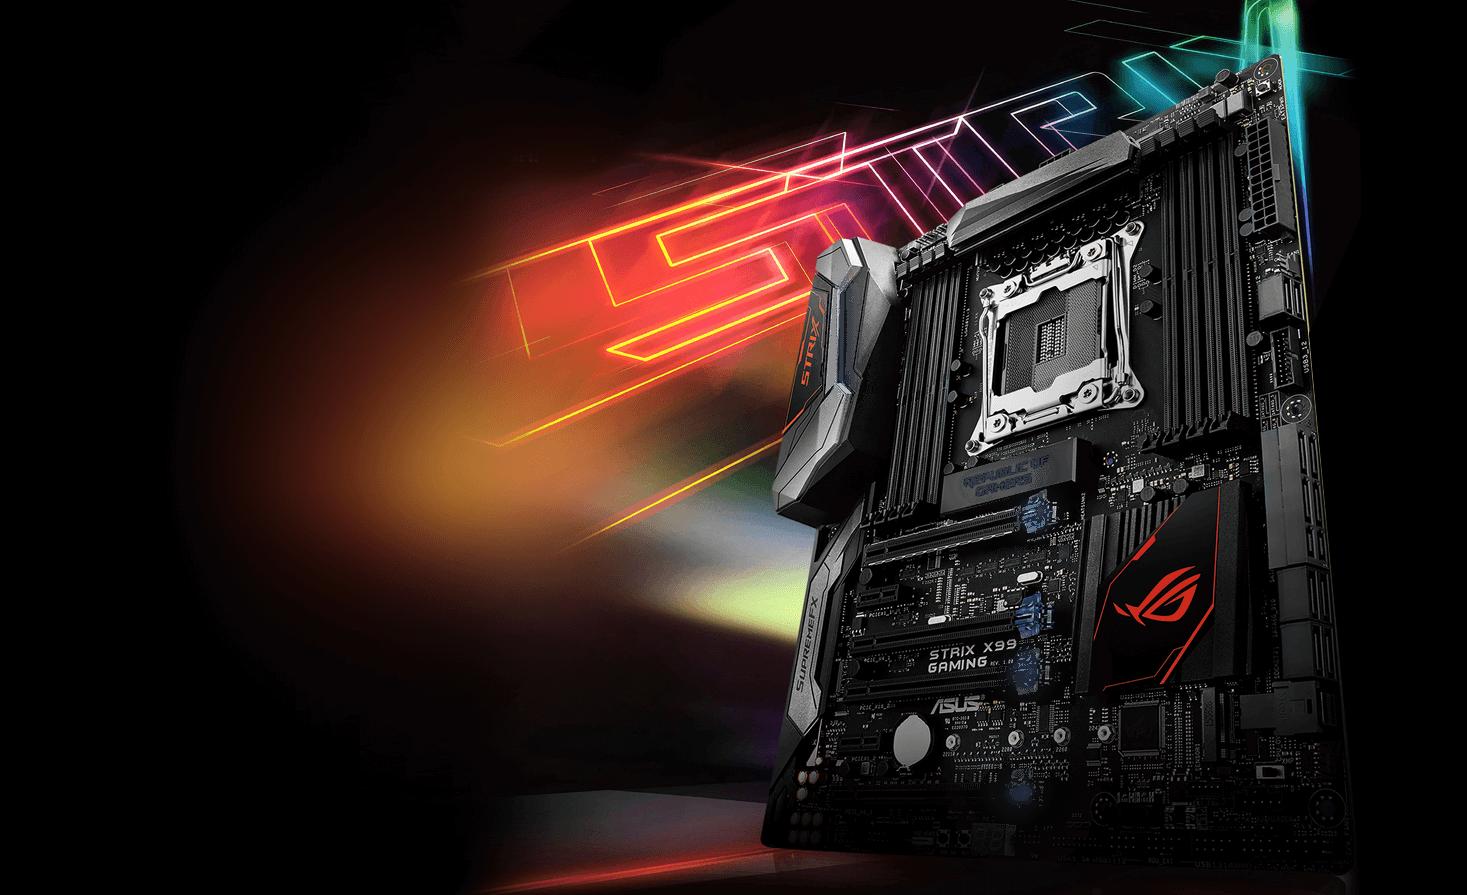 Asus Releases New X99 Gaming Motherboard - Legit Reviews